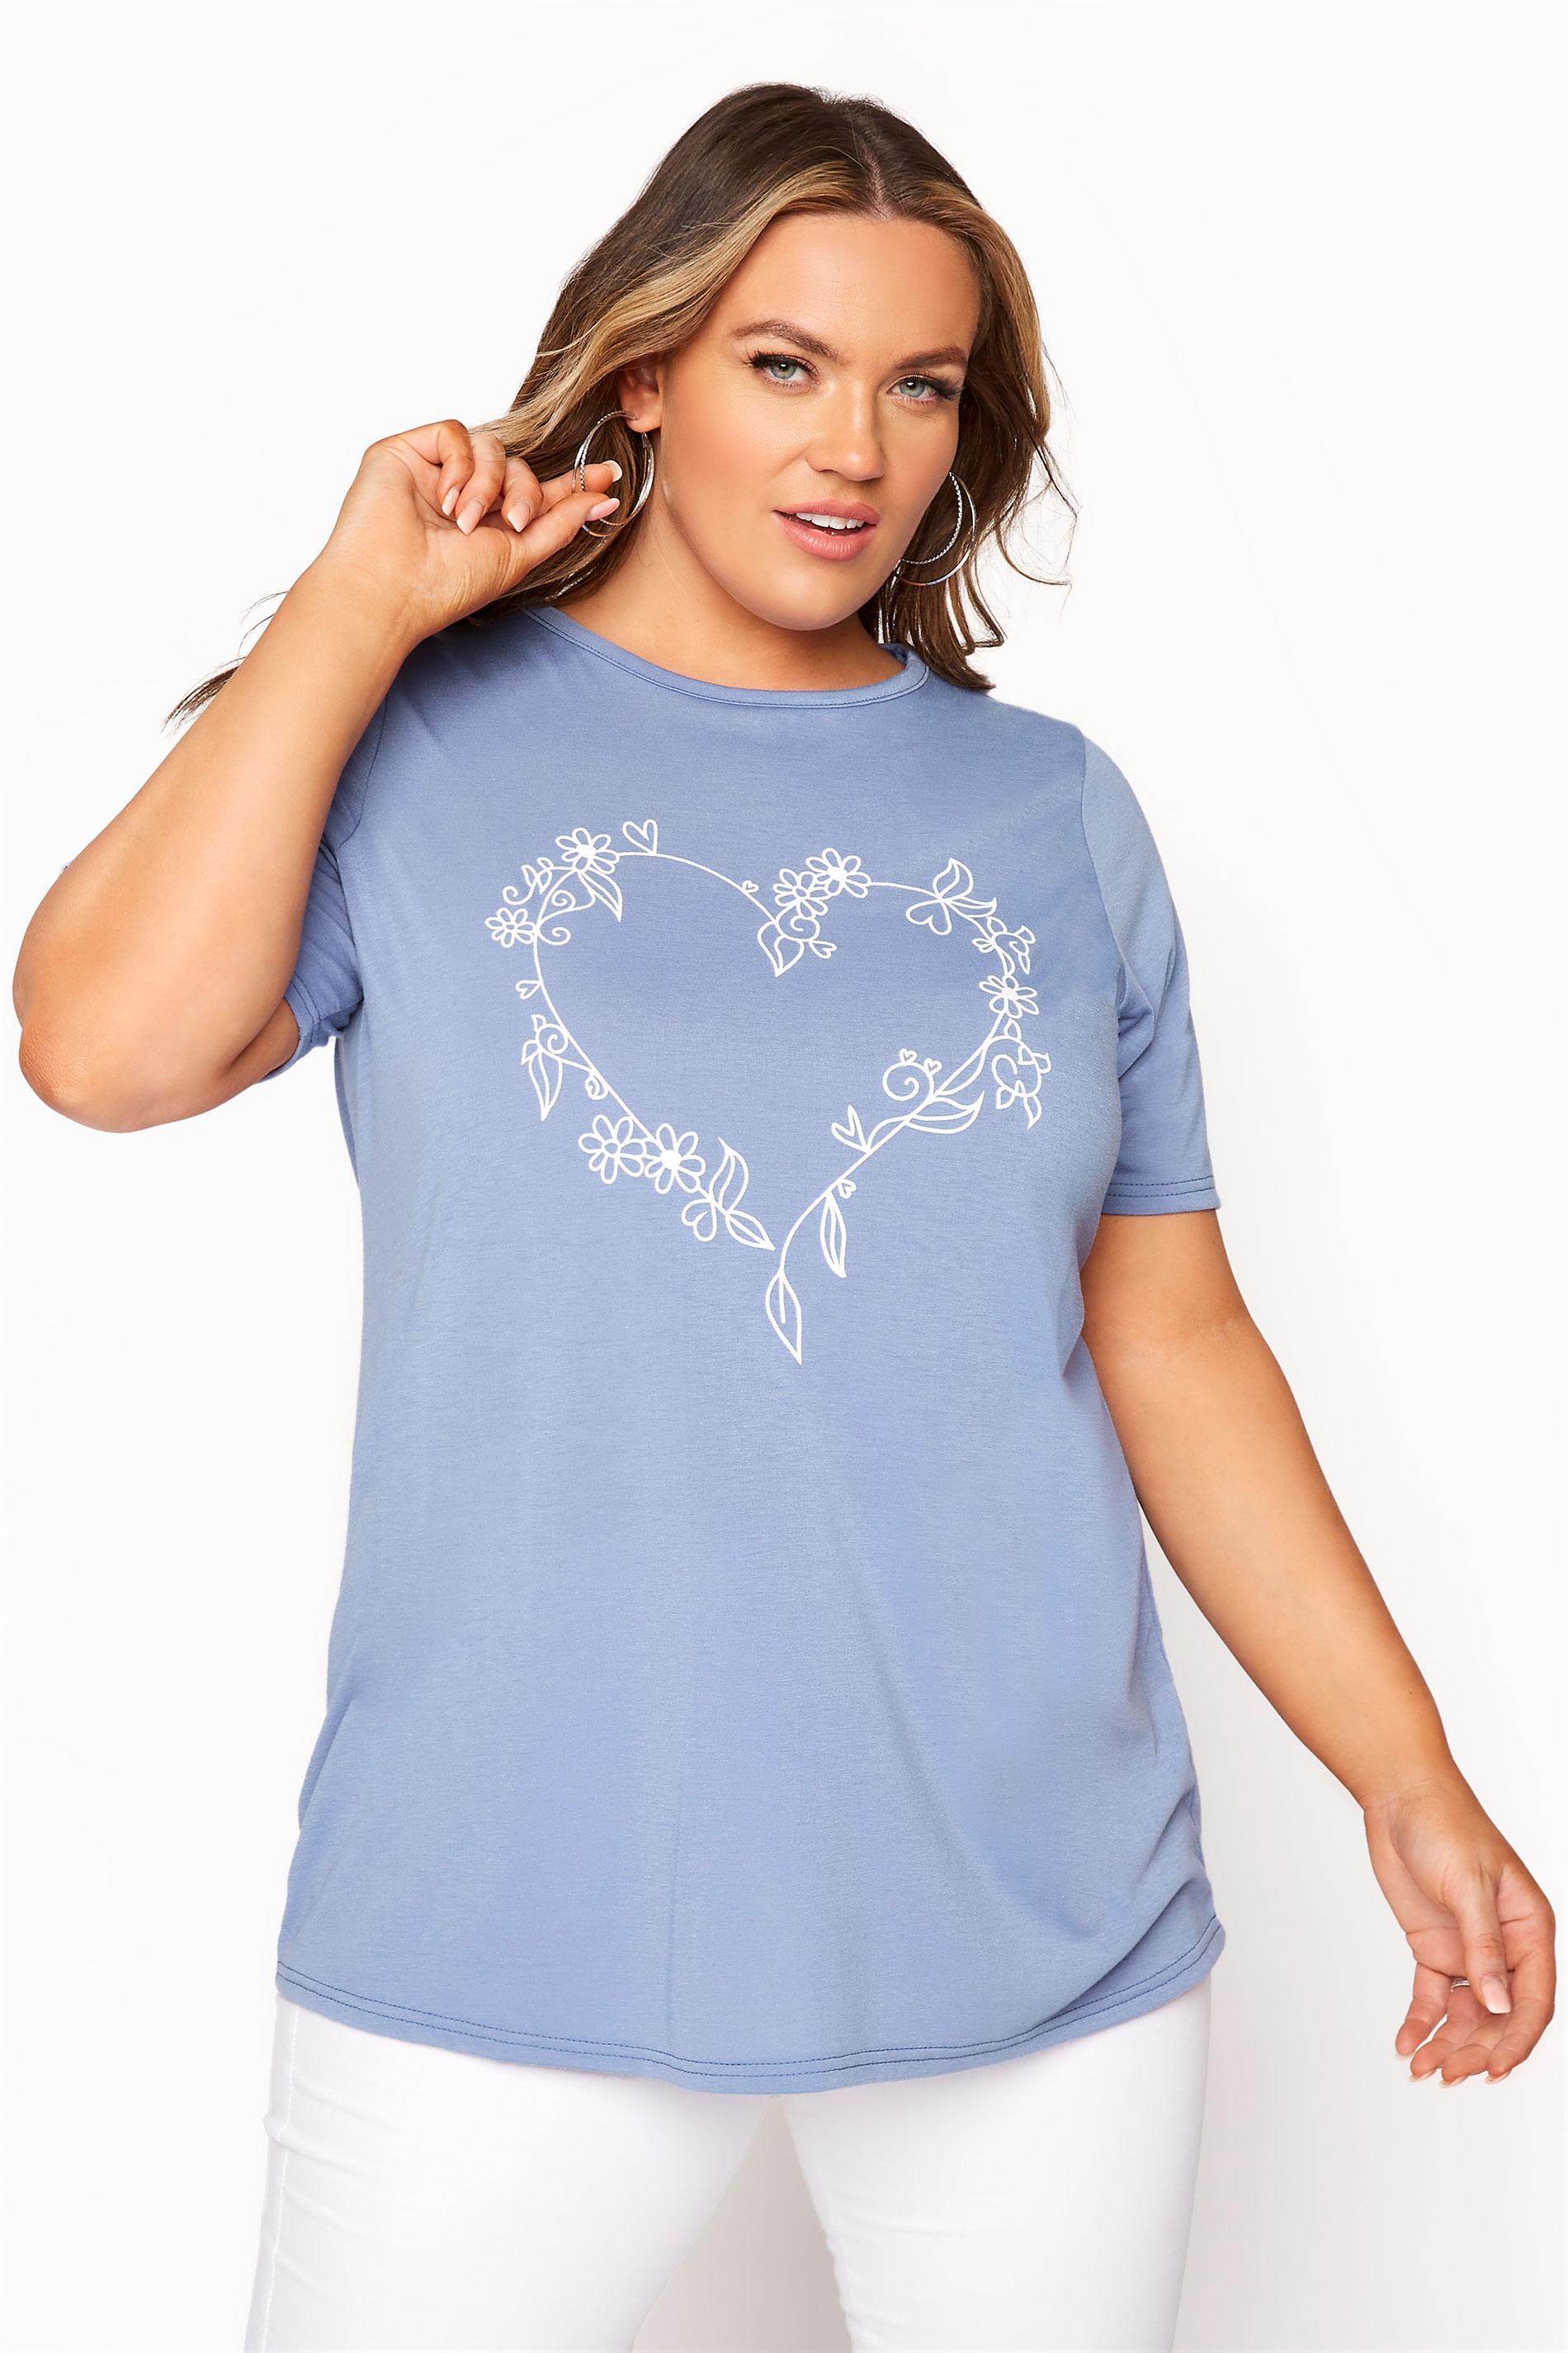 LIMITED COLLECTION Dusky Blue Heart Print T-Shirt_A.jpg